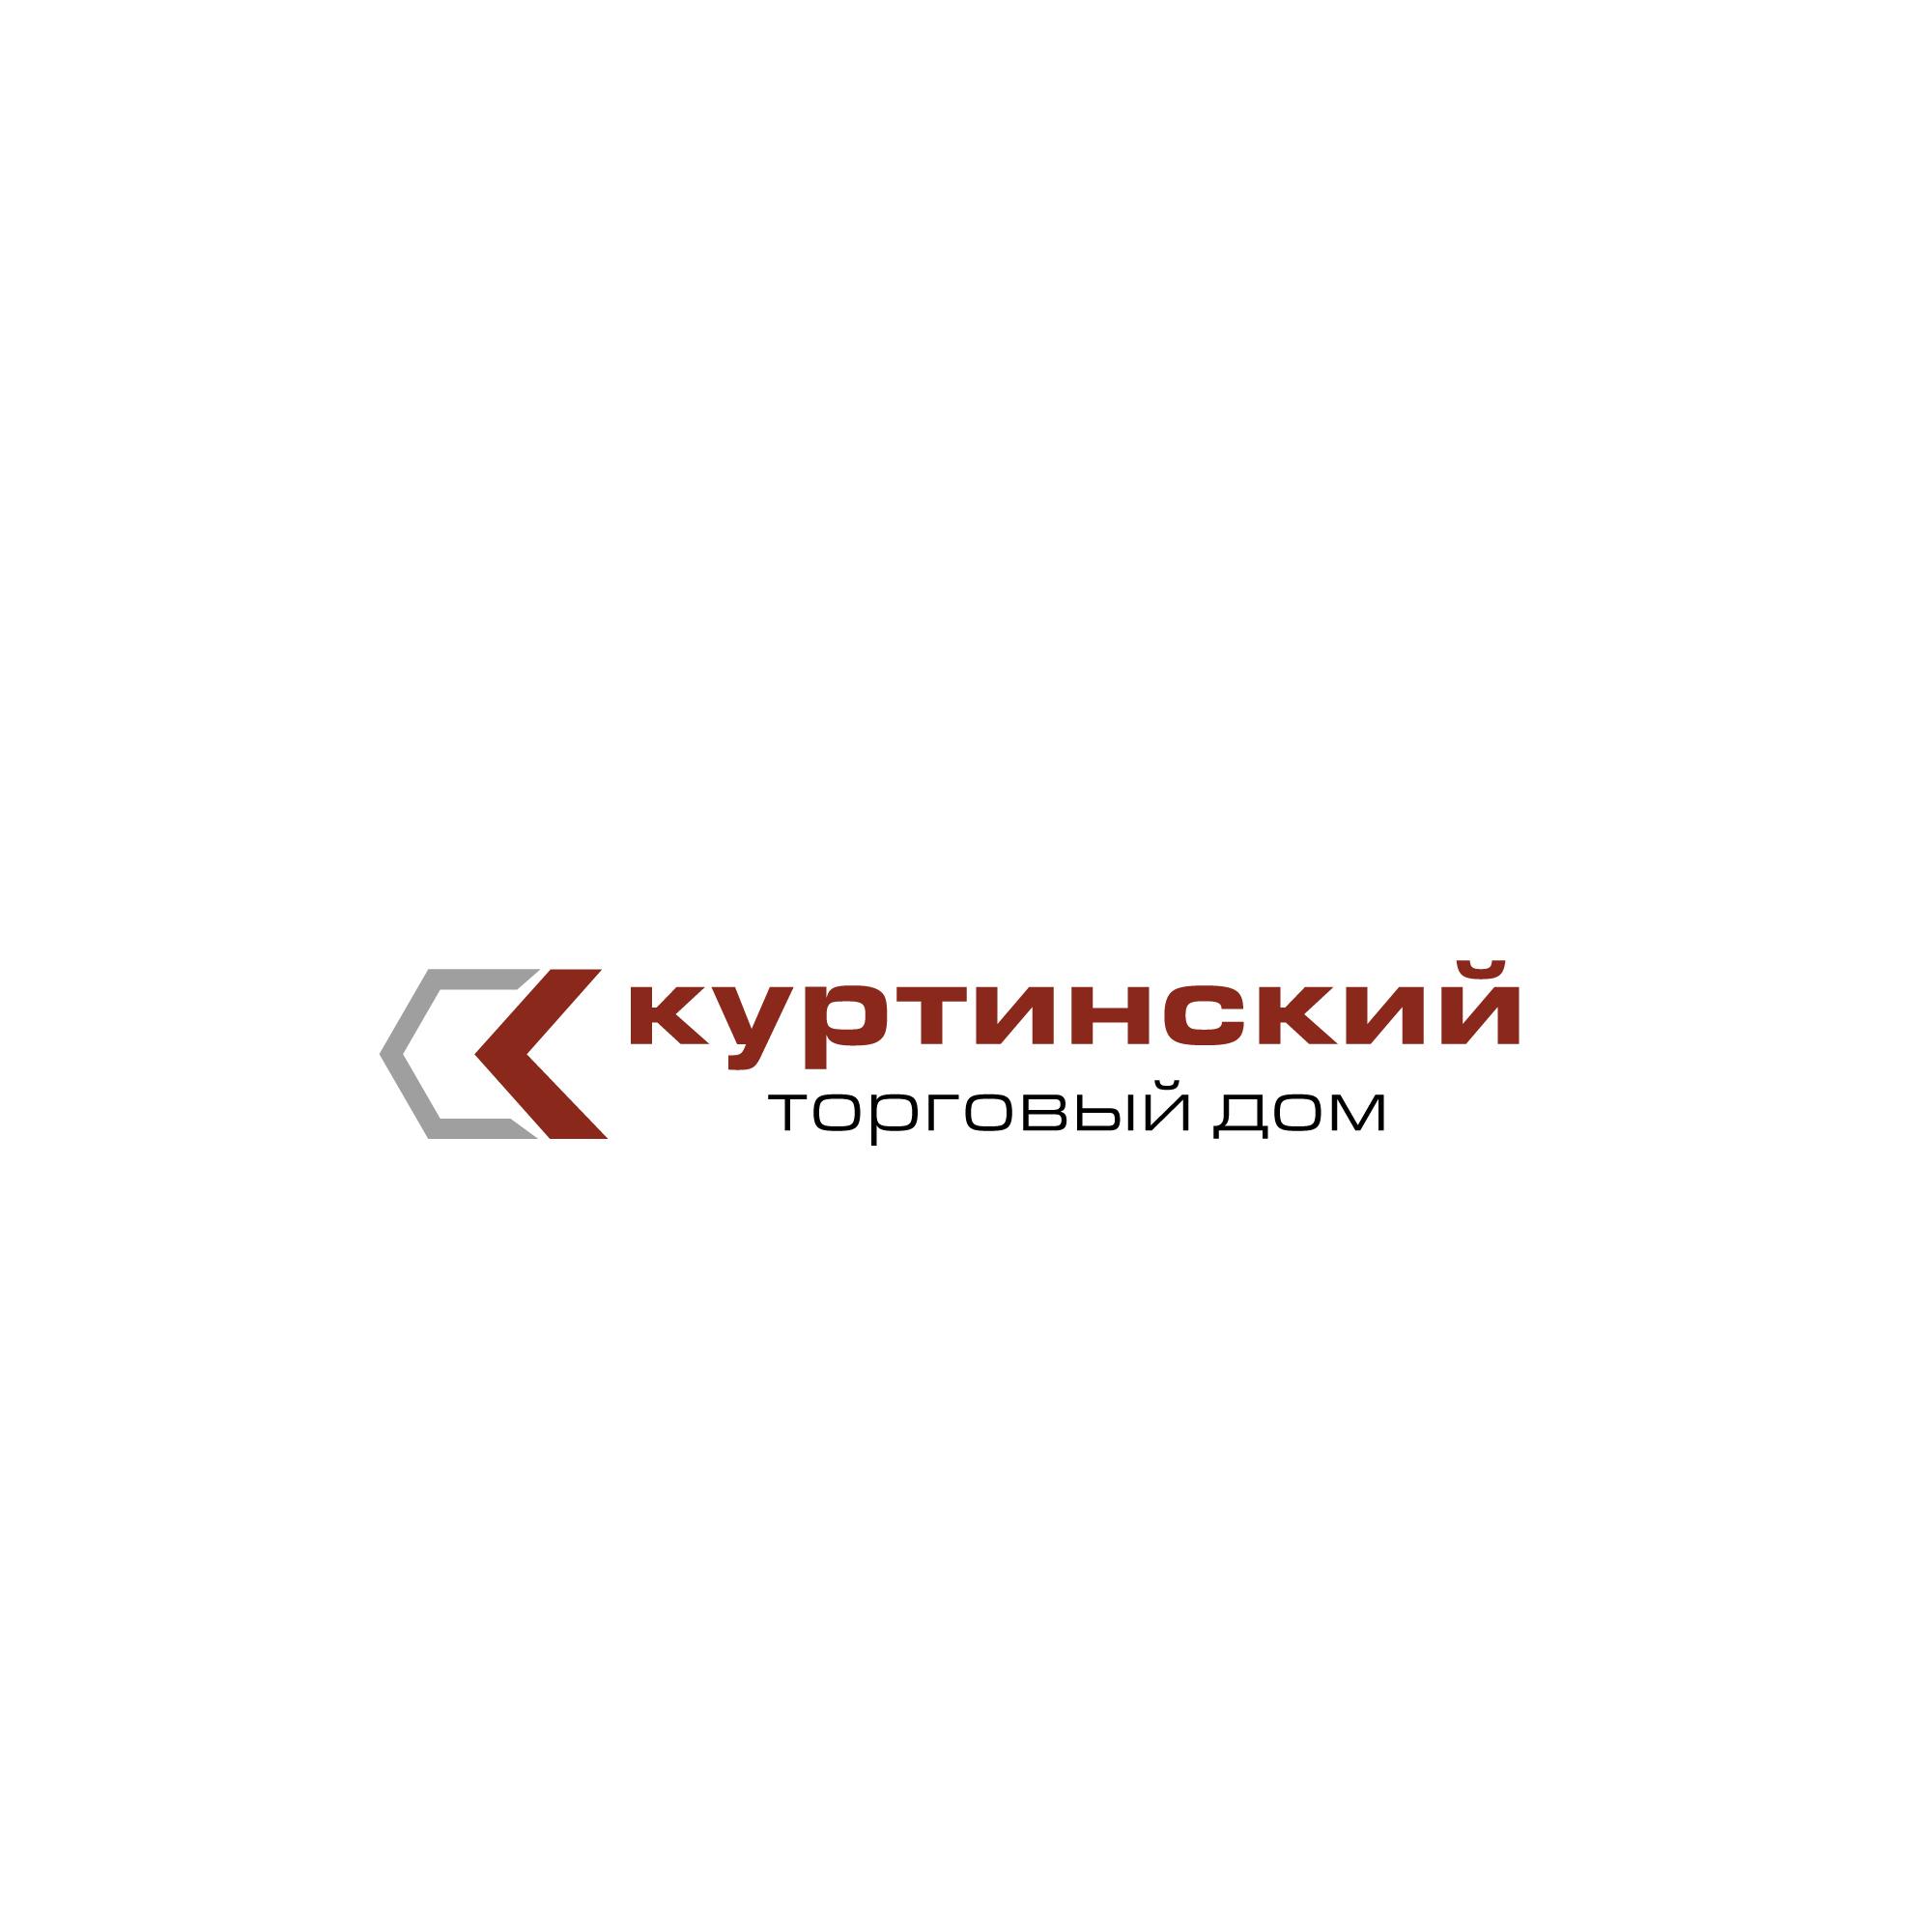 Логотип для камнедобывающей компании фото f_2395ba04b5126dc7.jpg